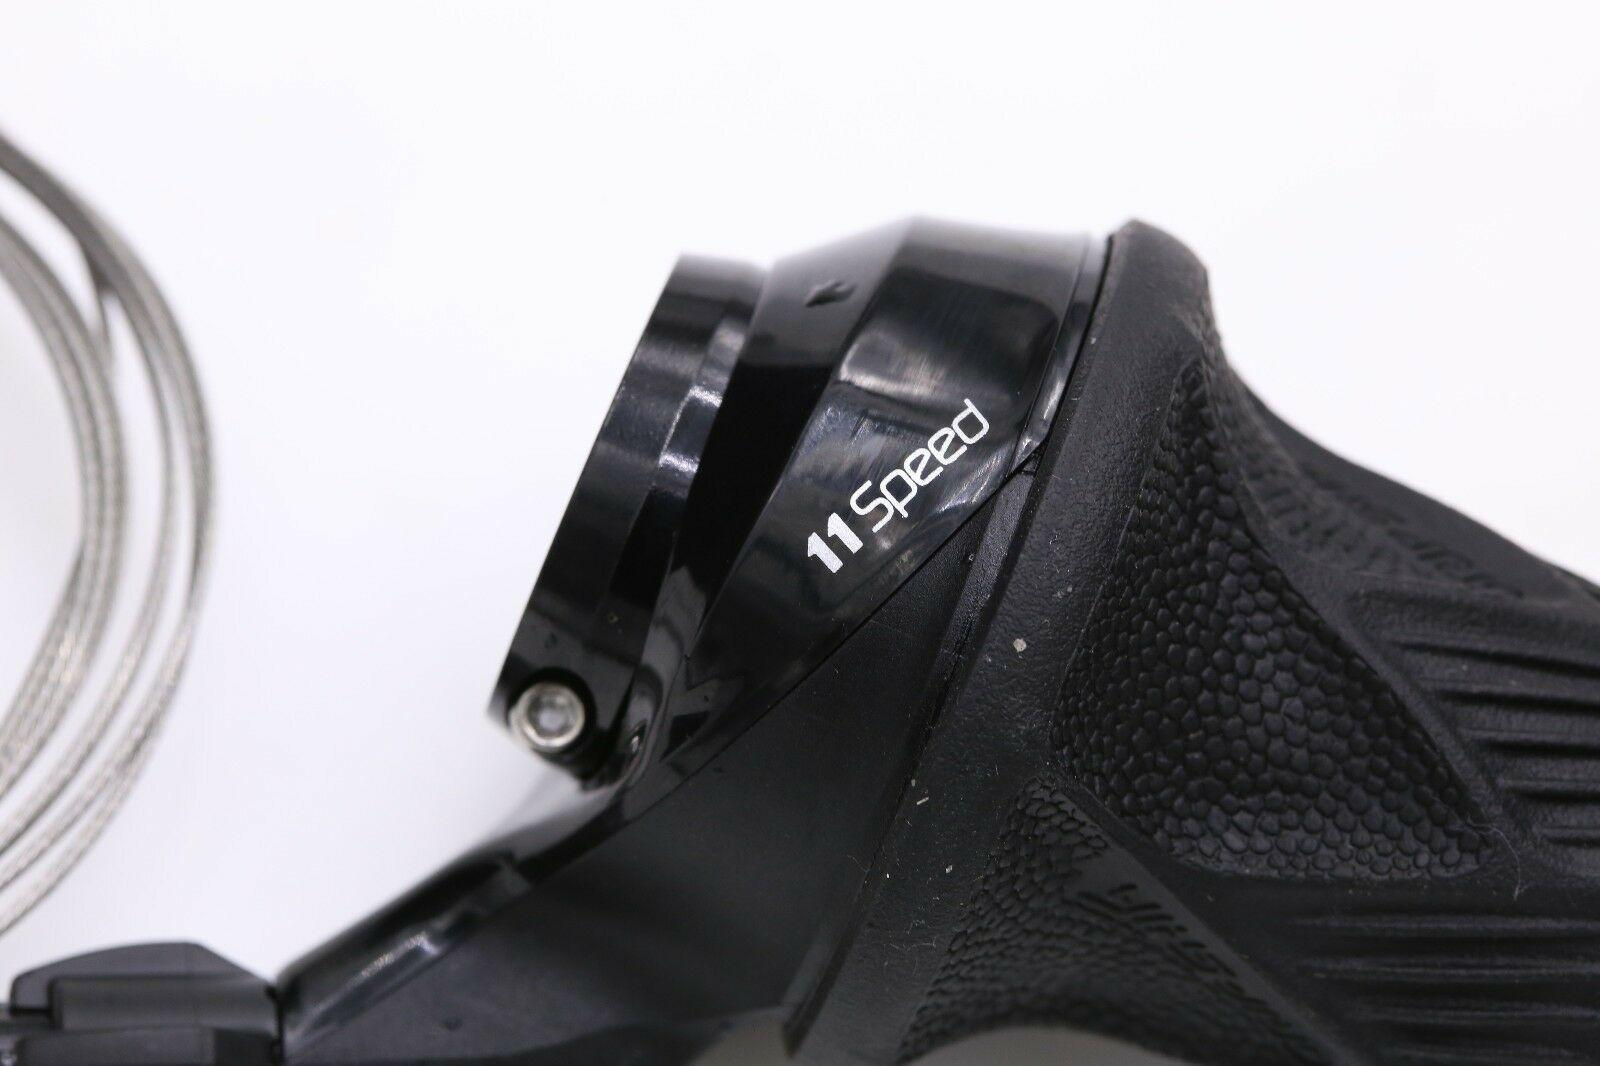 Sram Mtb Gx Grip Shift 11 Speed Rear With Locking Grip Shifter 11 Black